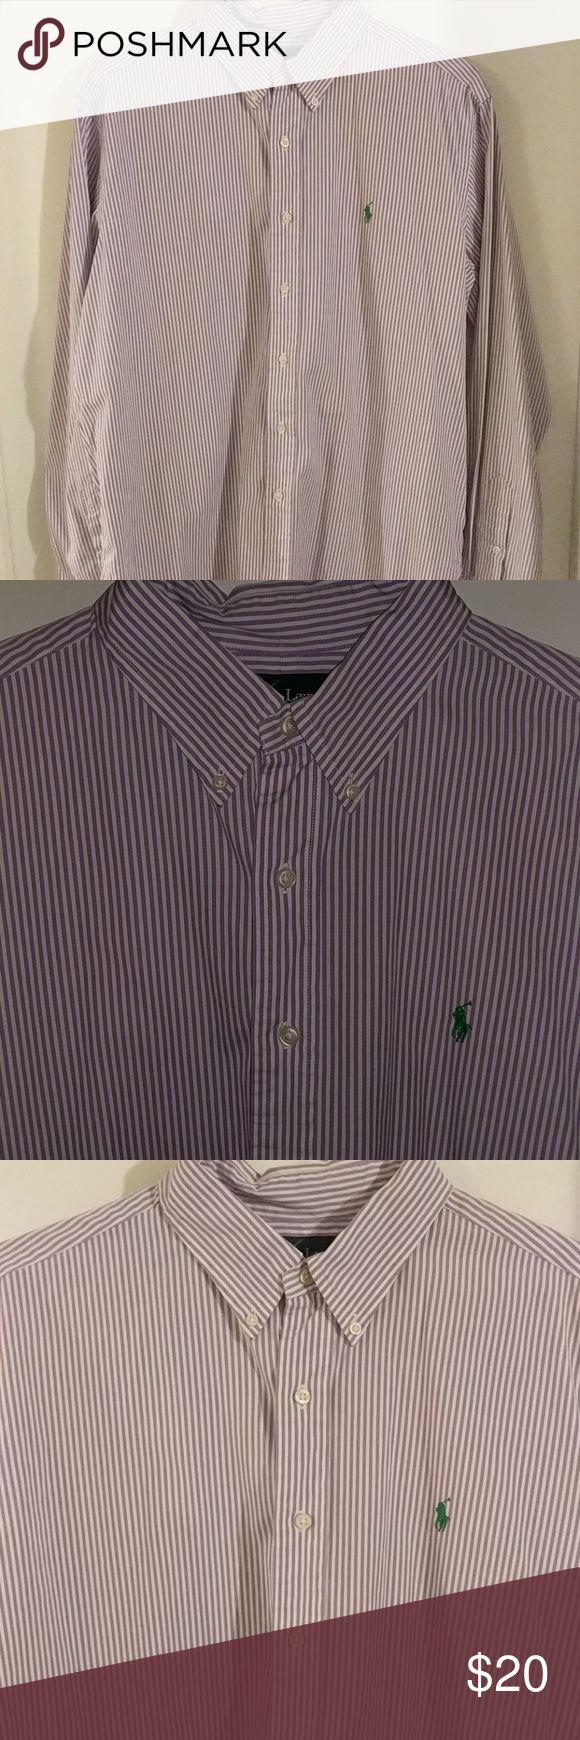 Polo Dress Shirt White with Purple Stripes & Green Polo Symbol Polo by Ralph Lauren Shirts Dress Shirts